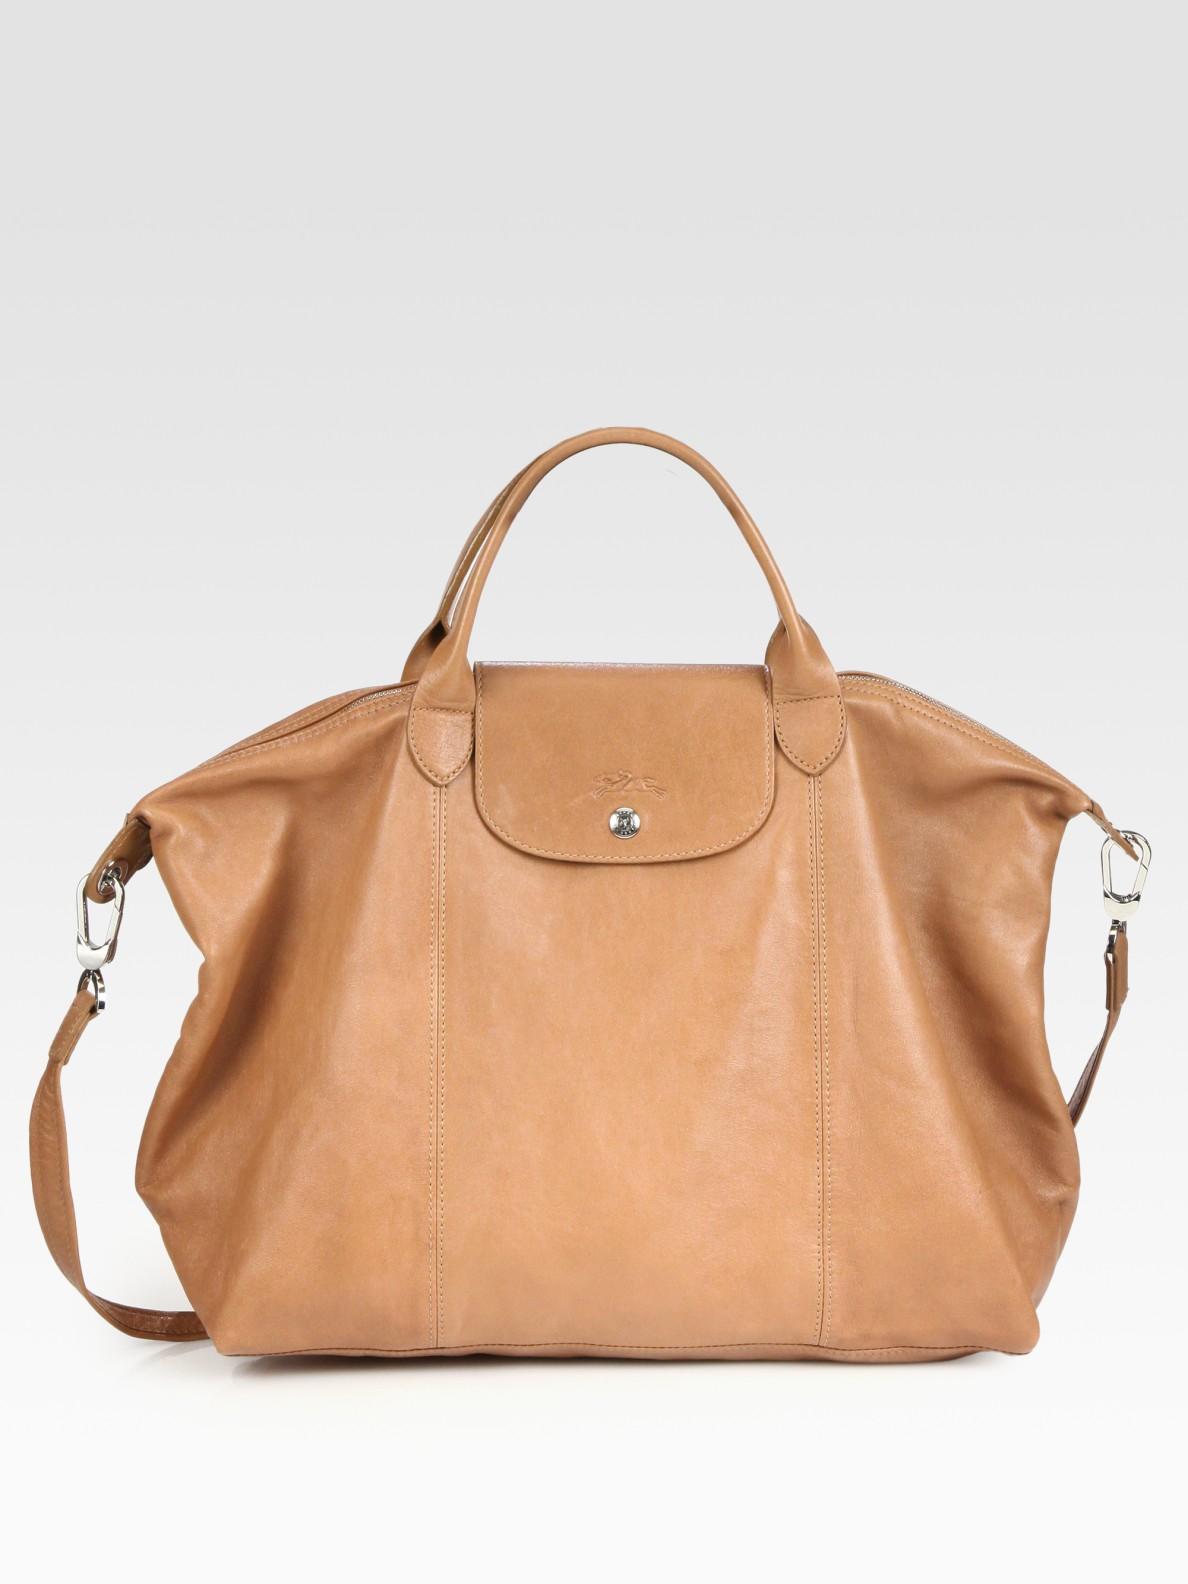 Lyst - Longchamp Le Pliage Cuir Large Handbag in Brown 4dc9a5fb06ca6